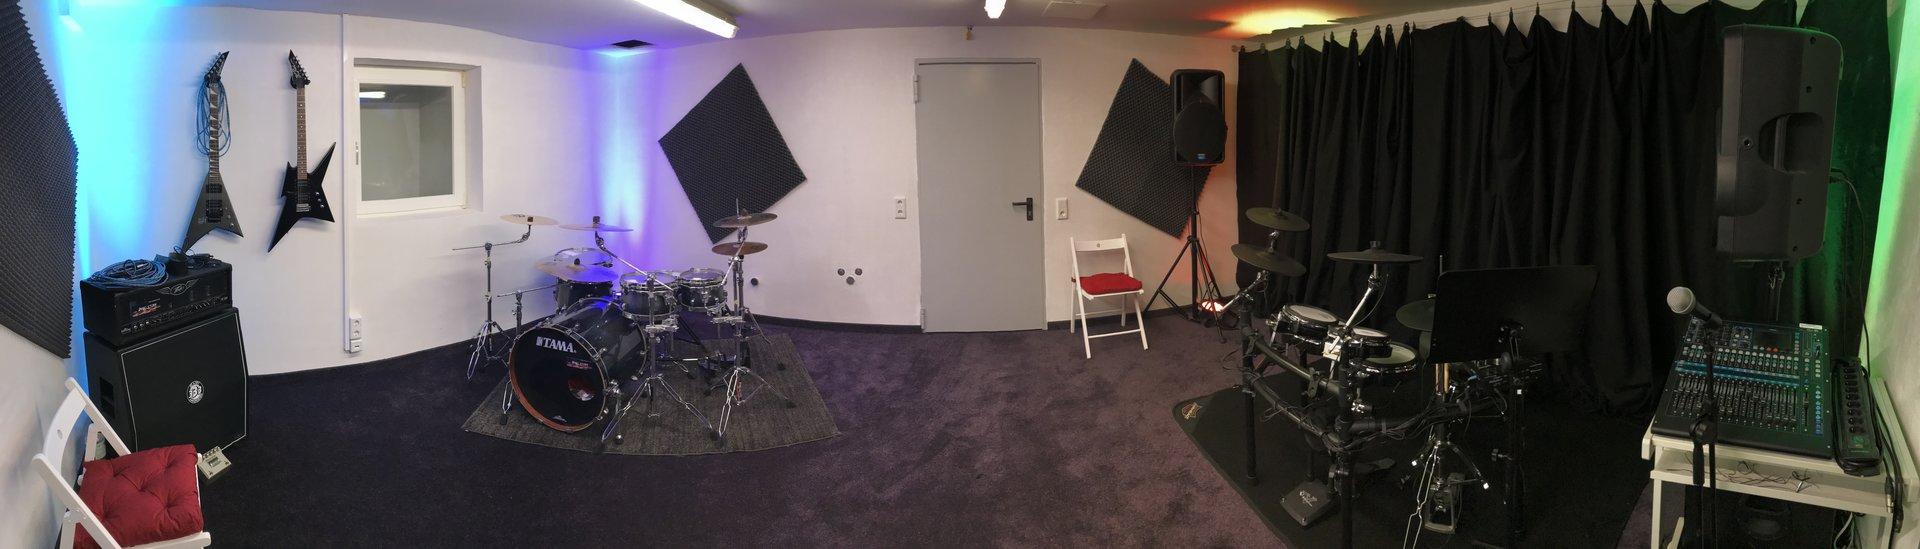 Proberaum bei Recording Sylt in Westerland